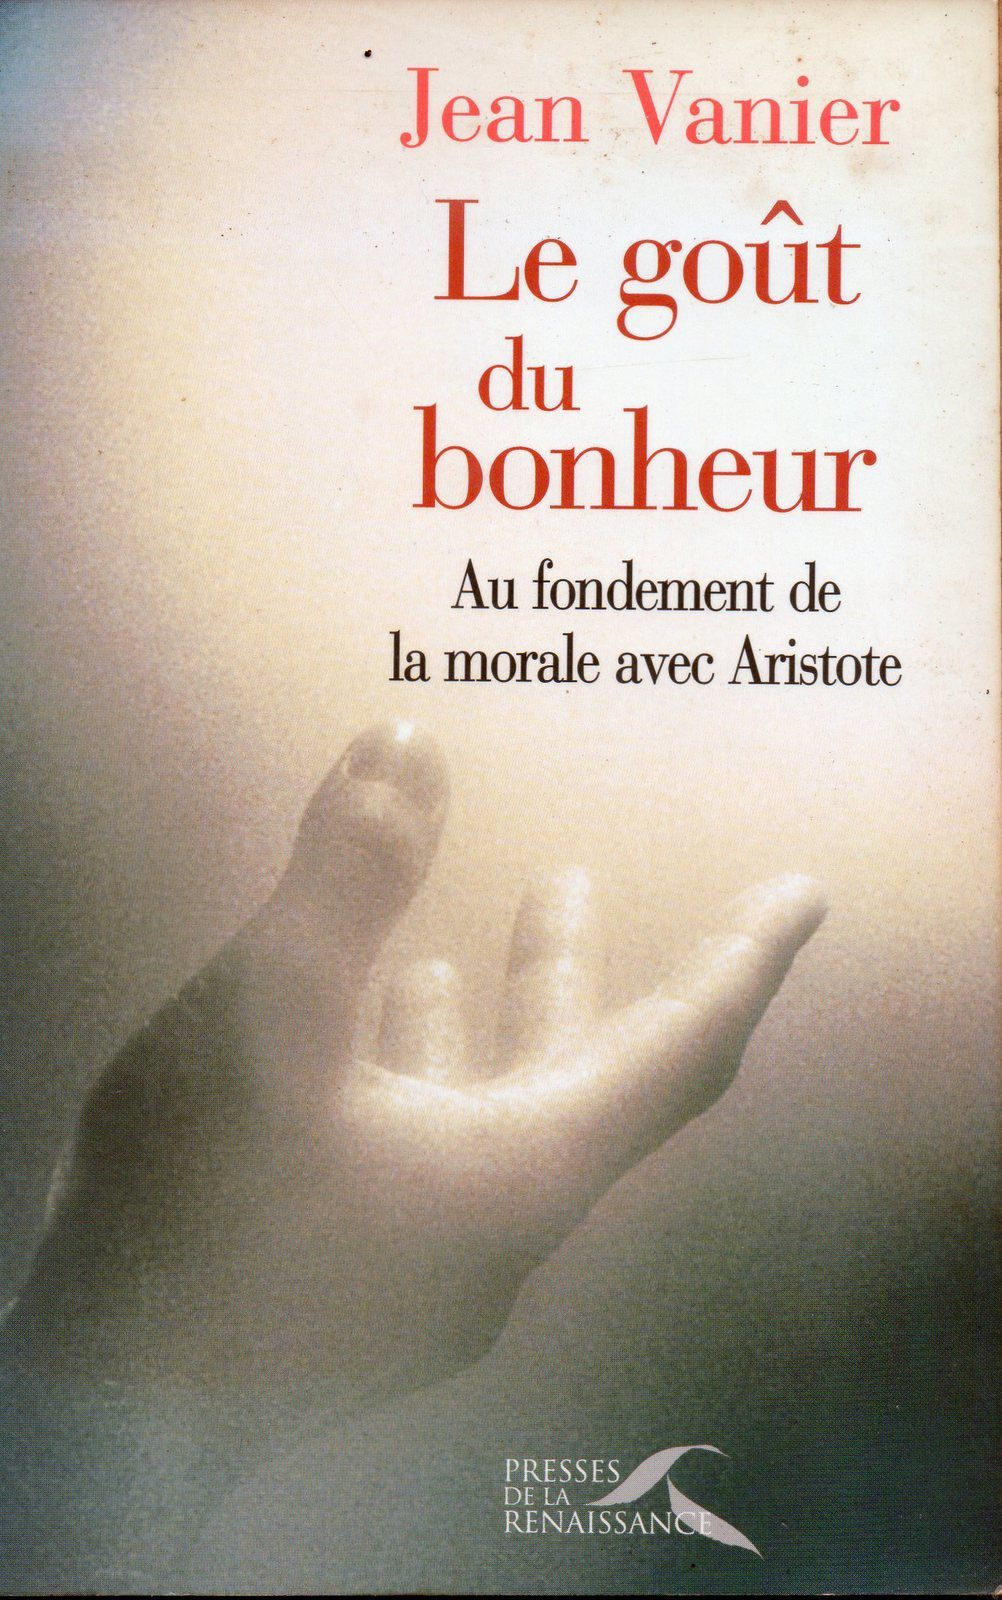 Jean Vanier : Transformer nos coeurs. ( Attribution du Prix Templeton 2015 à Jean Vanier [Lundi 09 mars 2015] ).